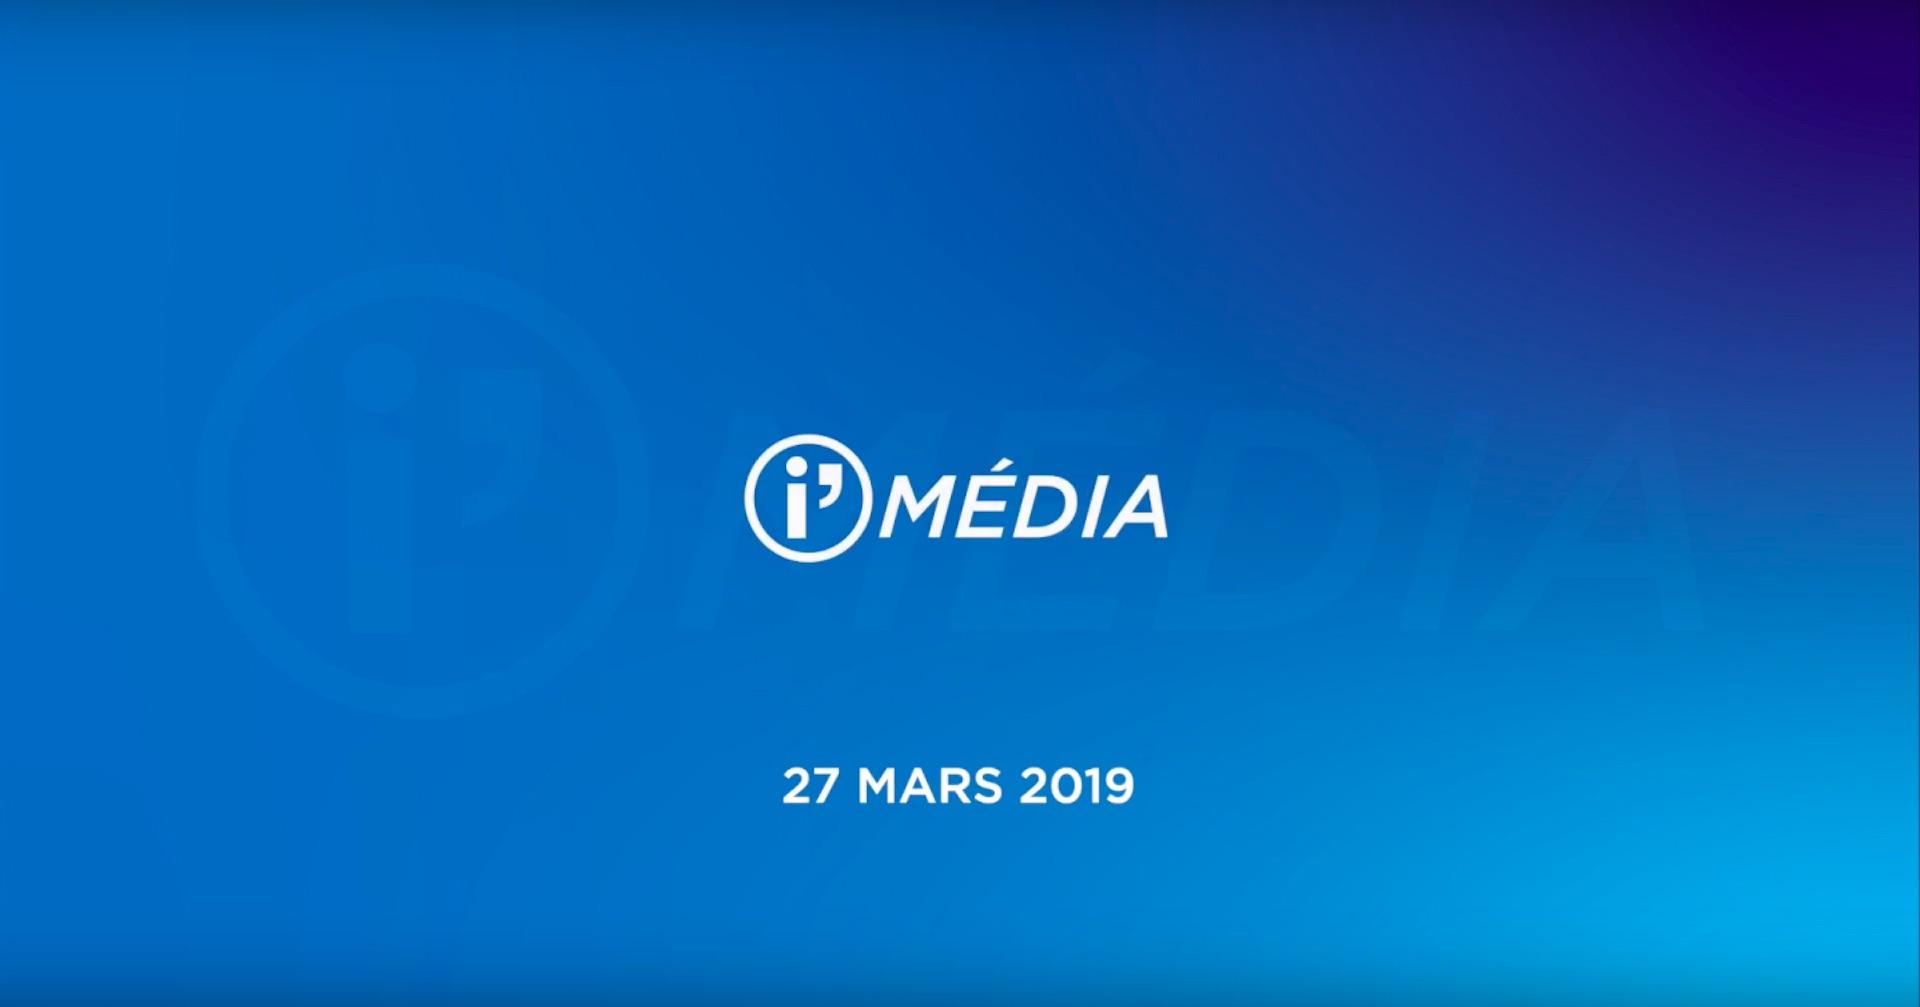 I'média 27.03.2019